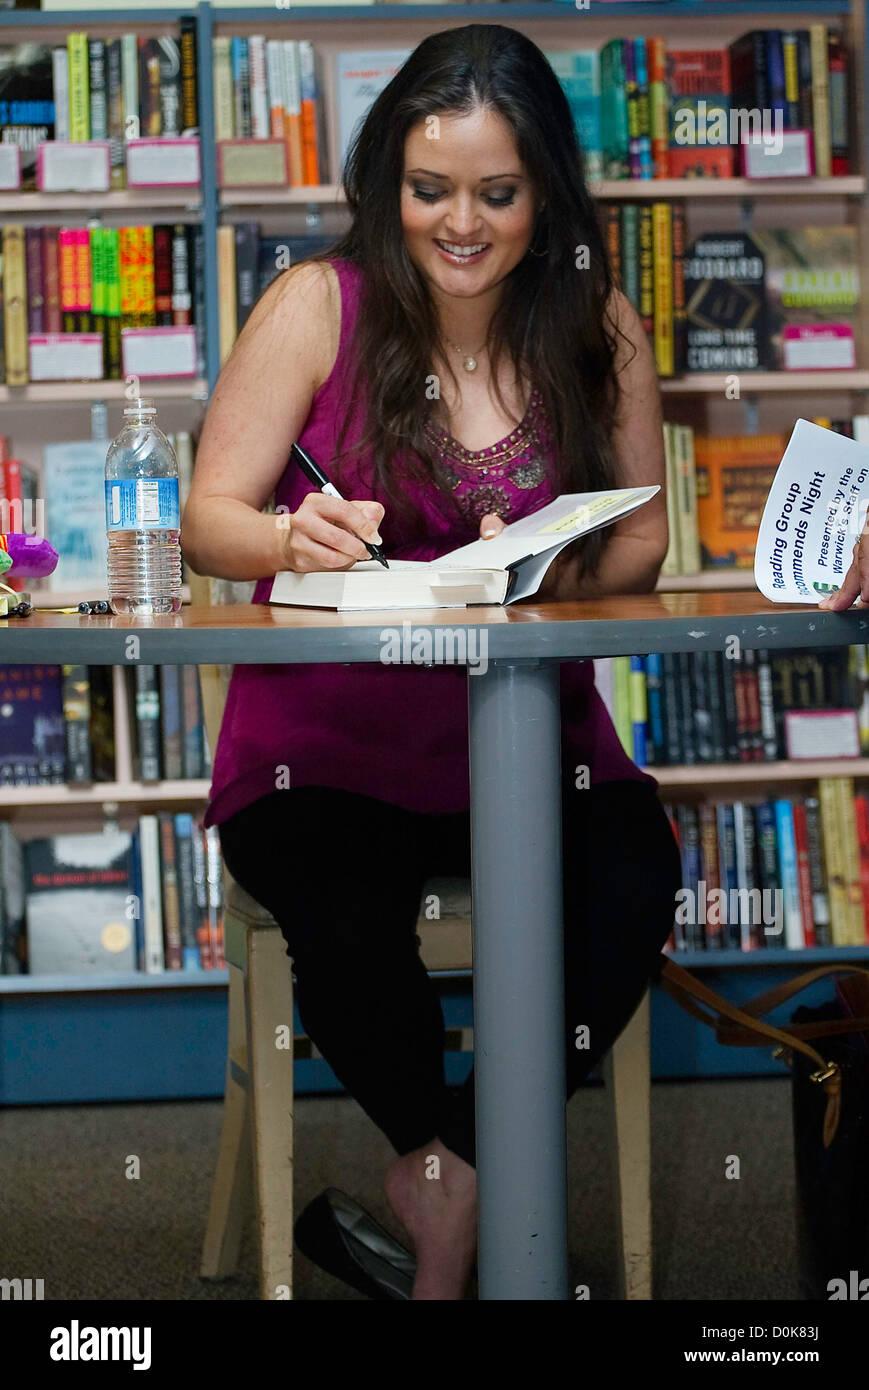 Danica Mckellar Signing Copies Of Her New Book Hot X Algebra Exposed At Warwicks La Jolla California